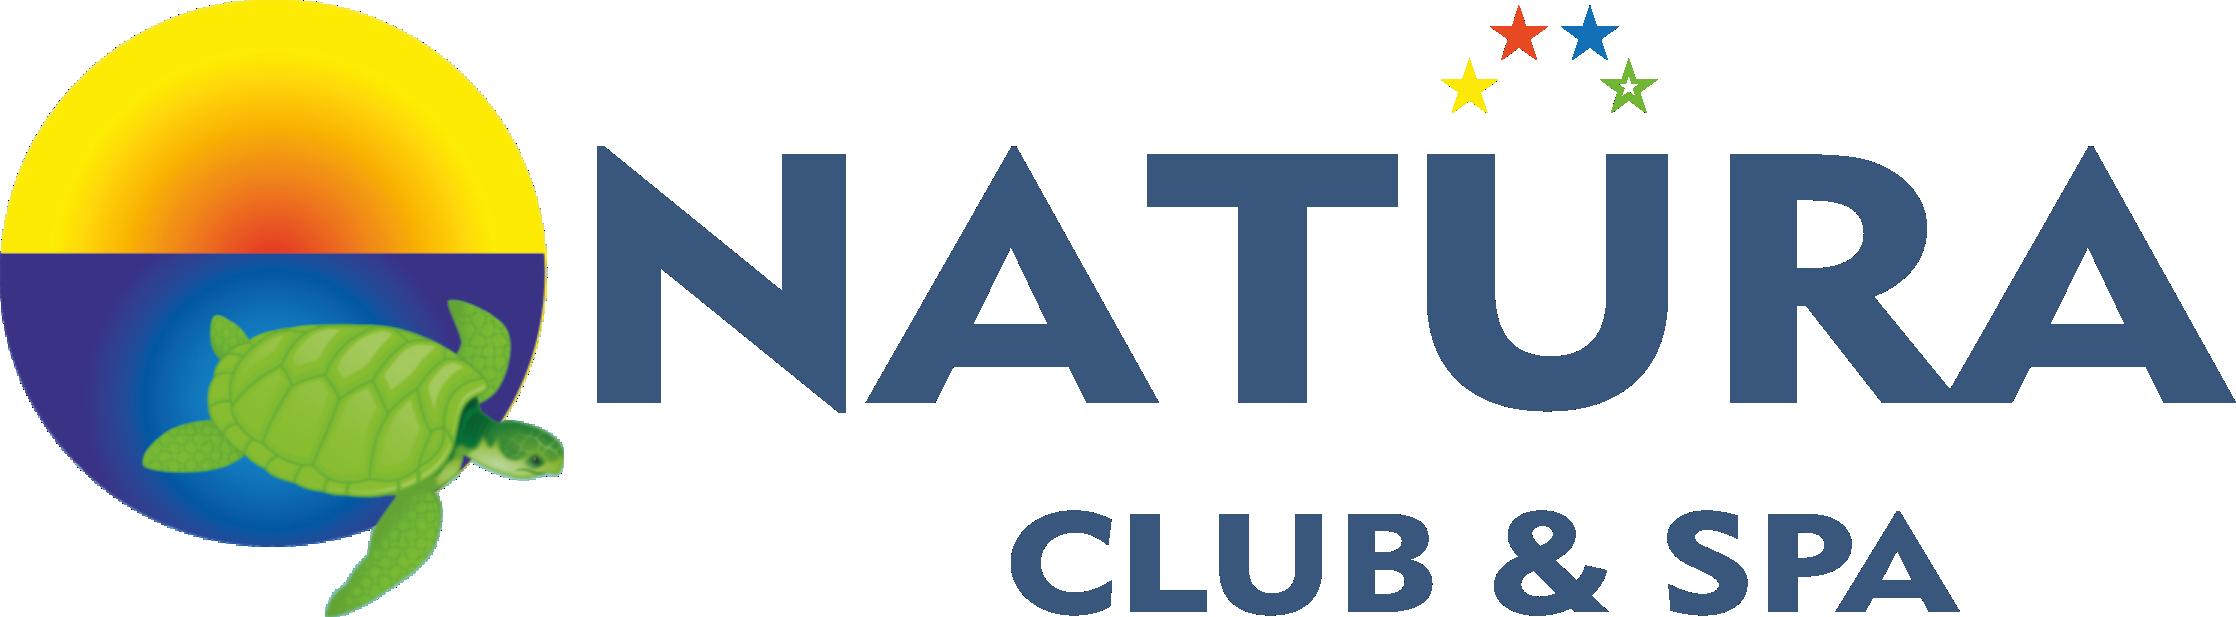 NATURA CLUB & SPA